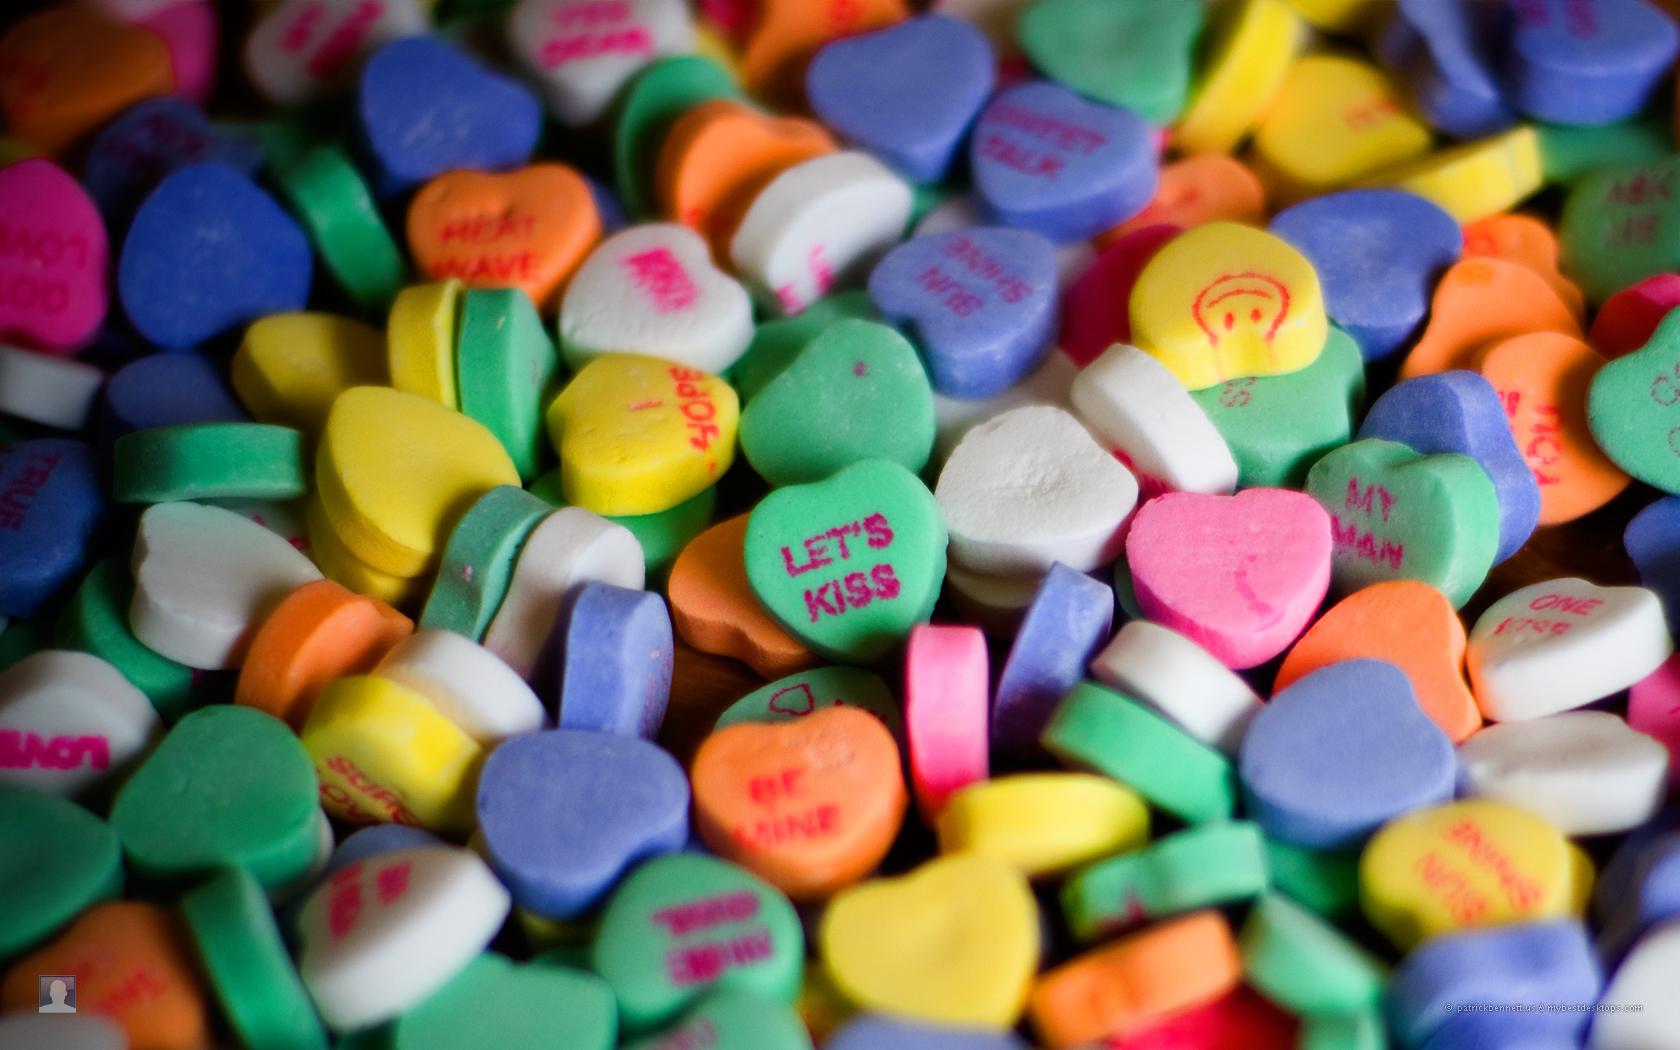 Pornostar Candy Love